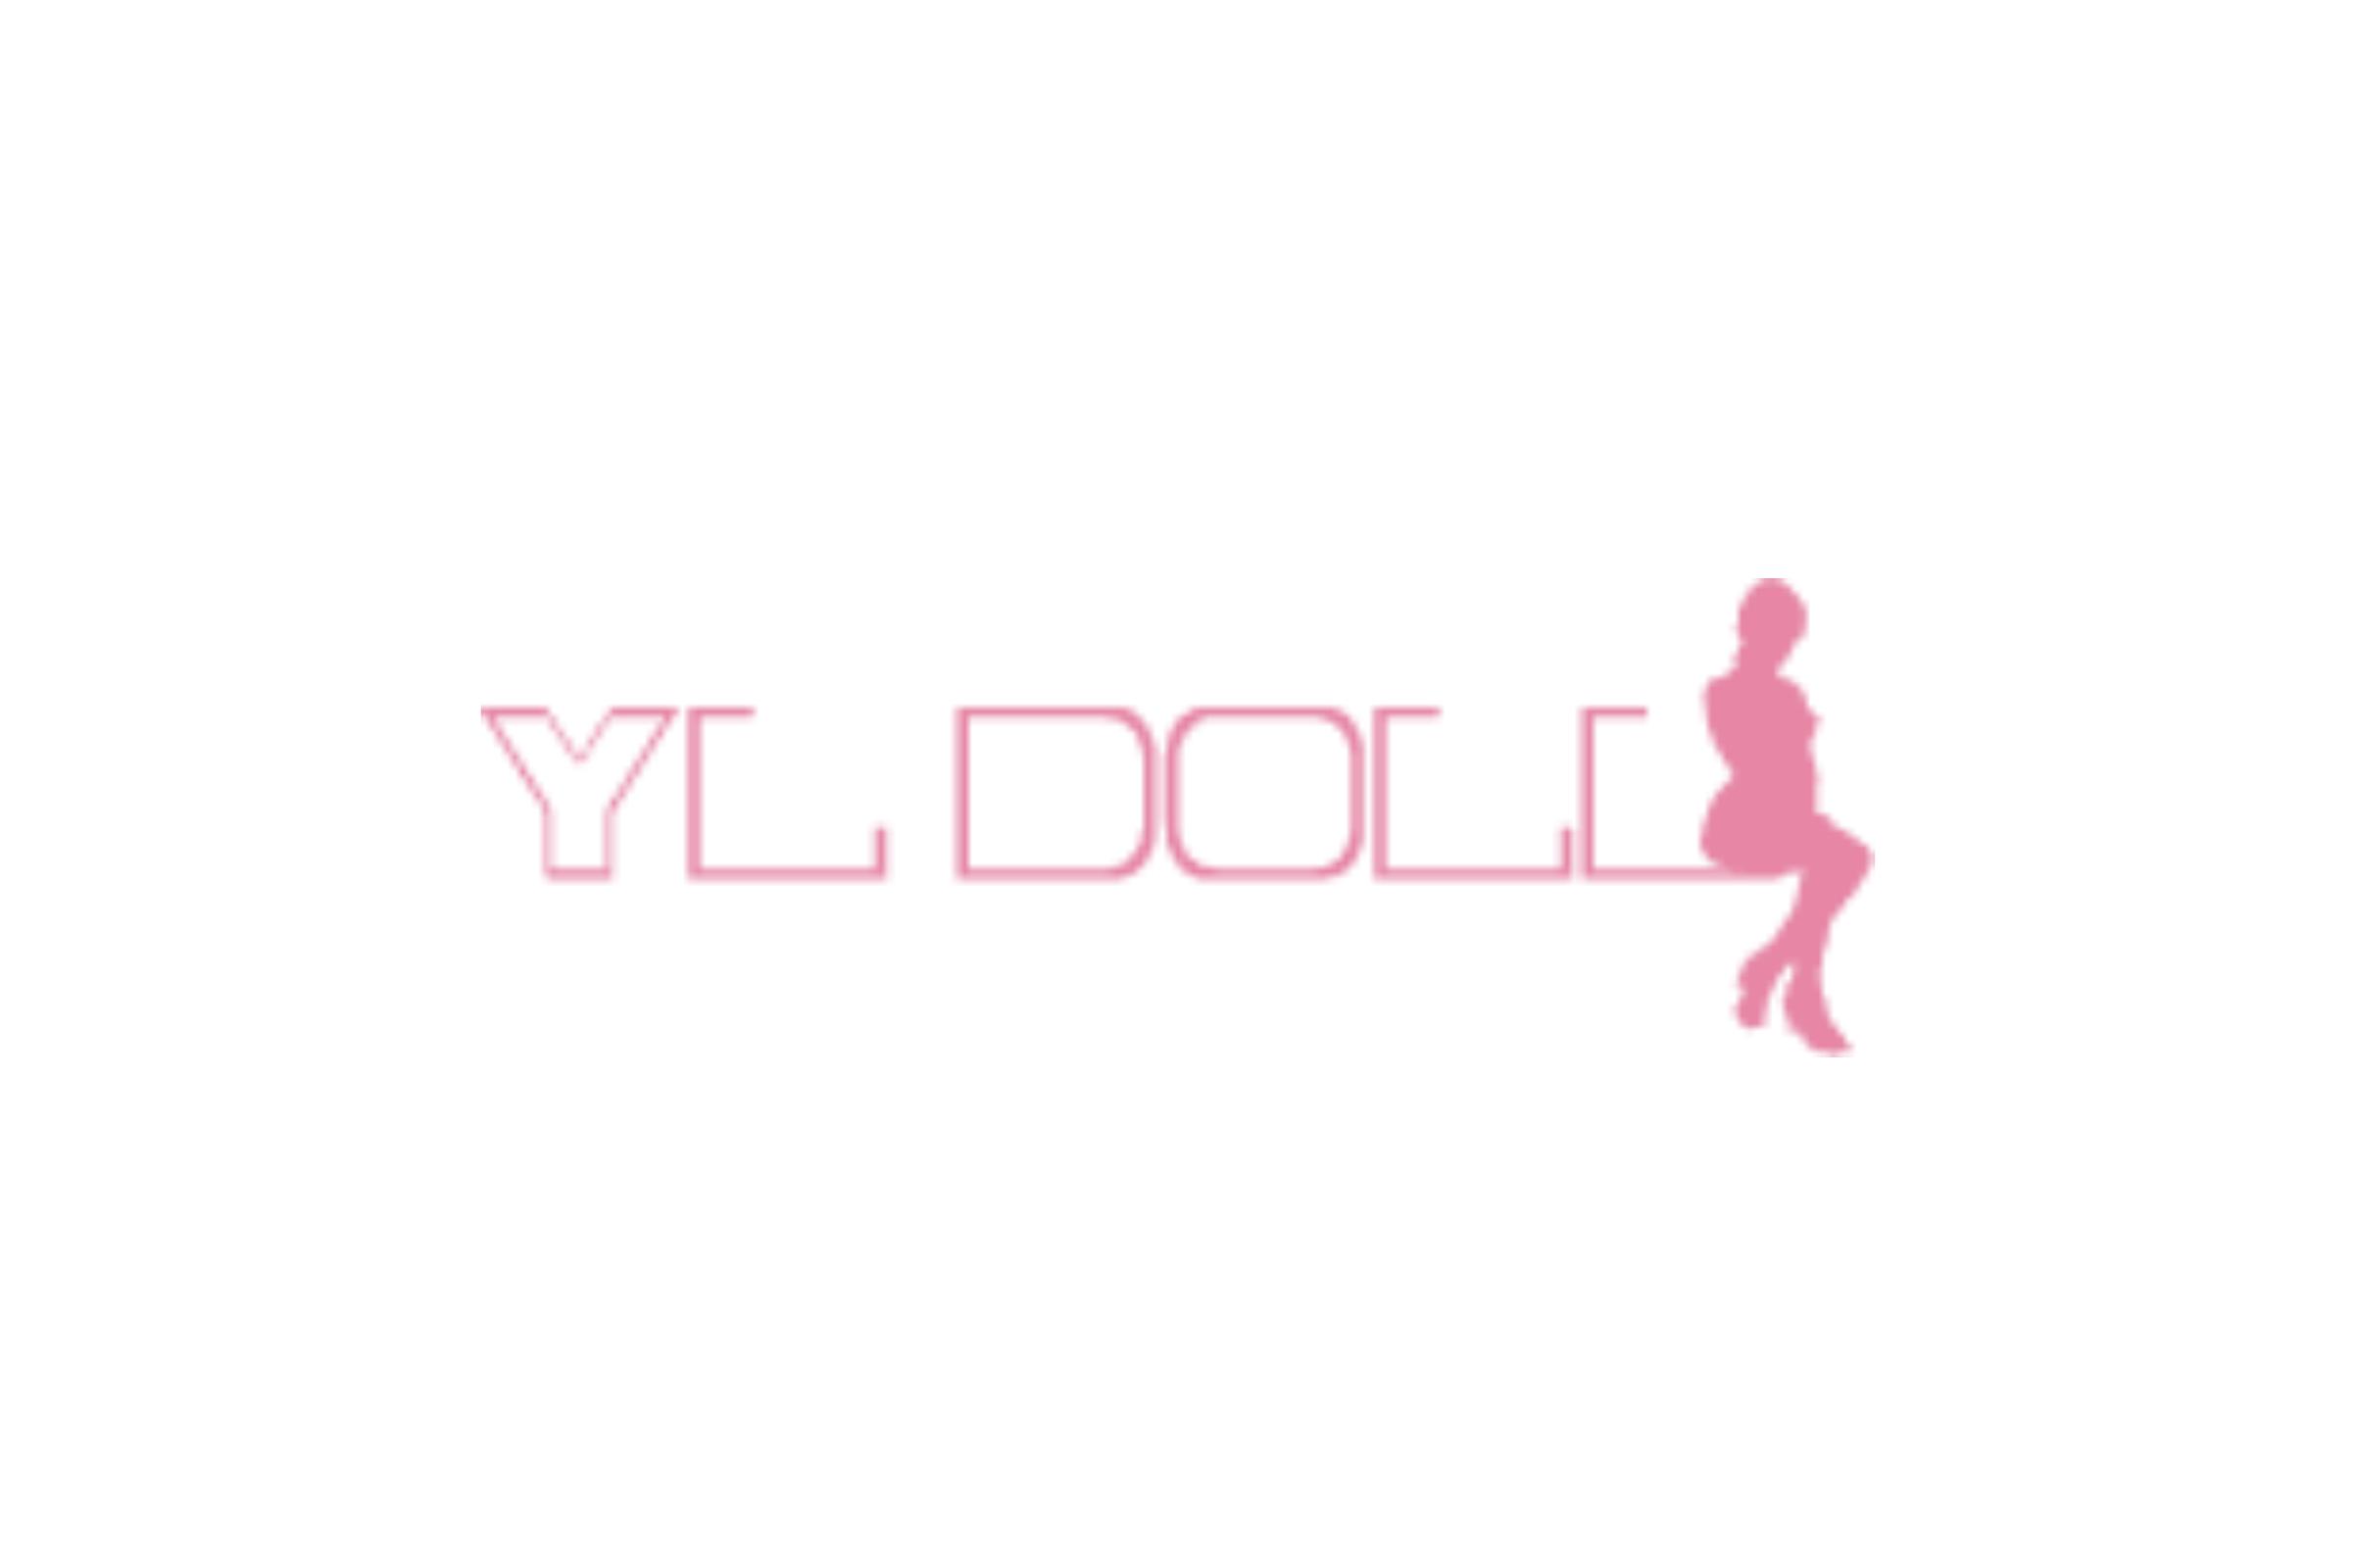 yl-doll-sex-doll.jpg